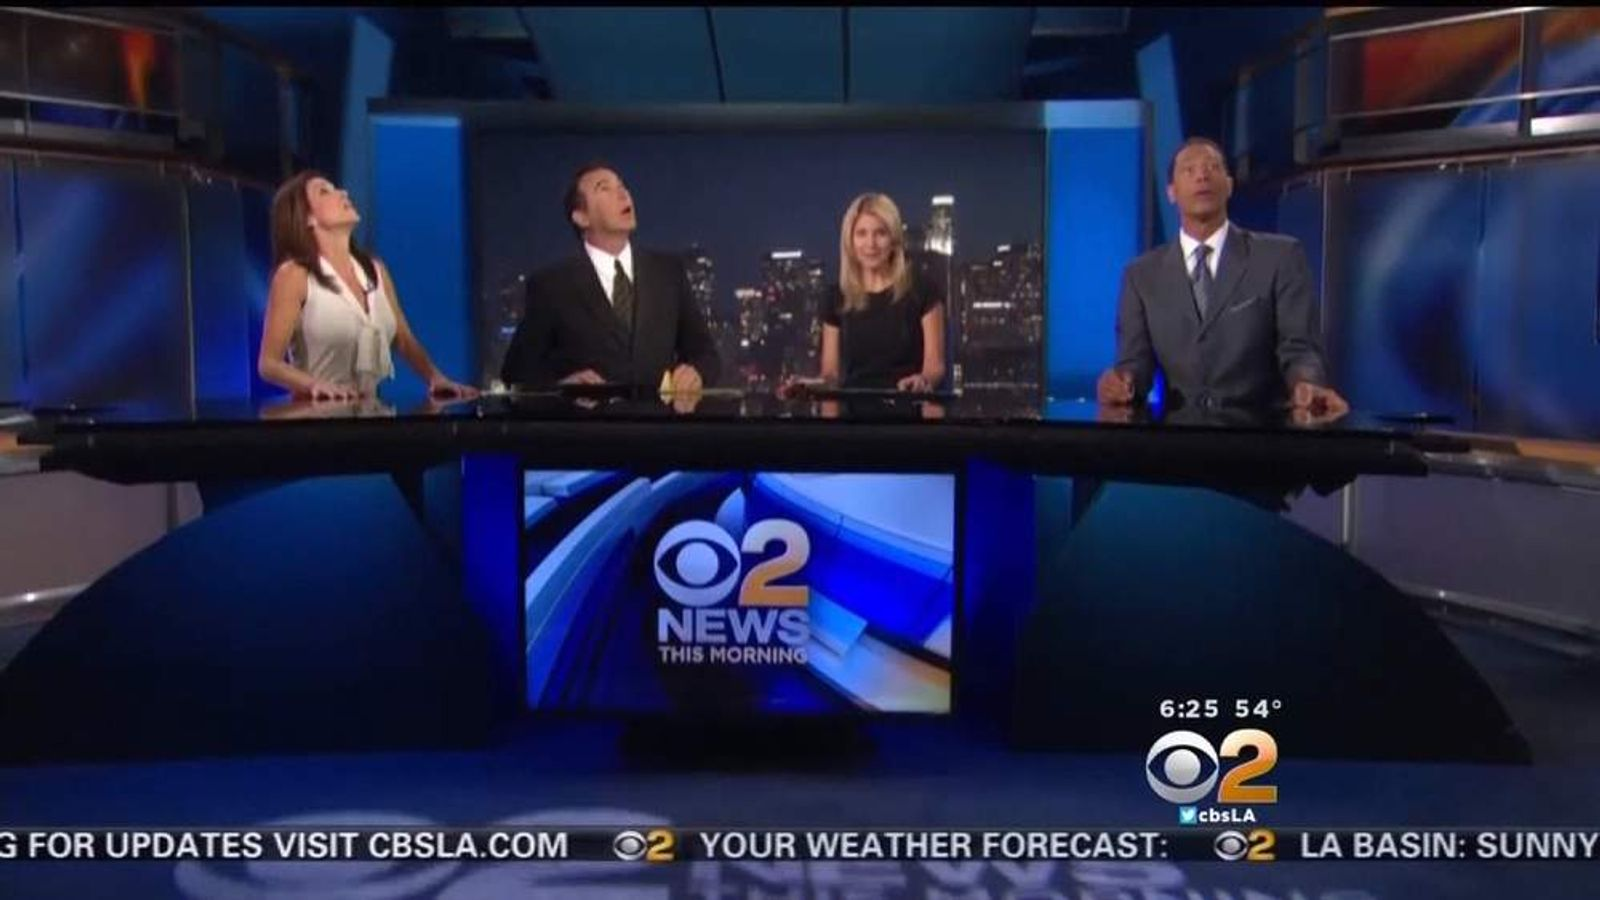 KCBS Anchors stop presenting as quake rocks their LA studio